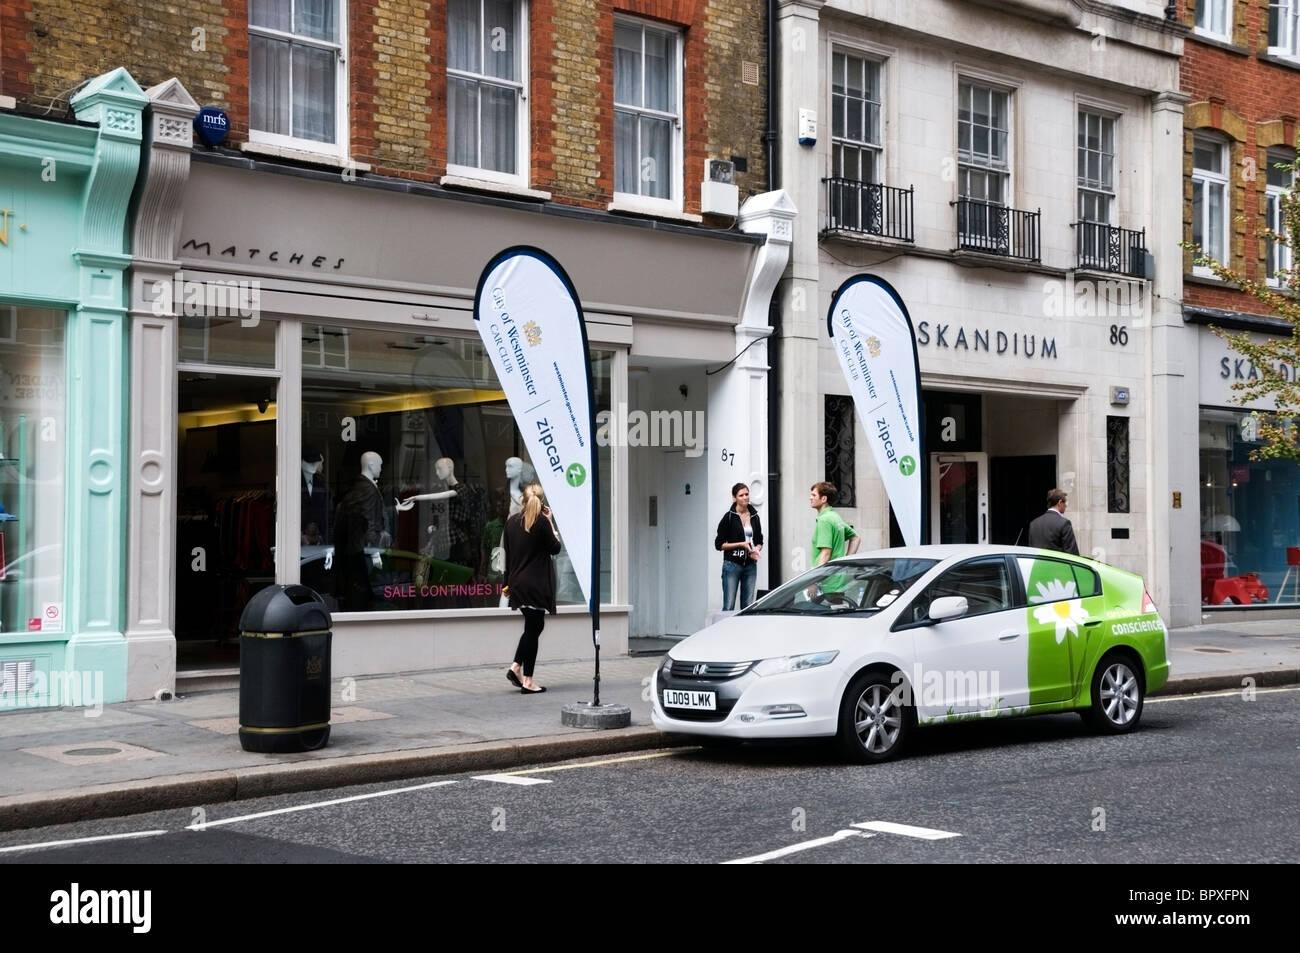 Zipcar advertising